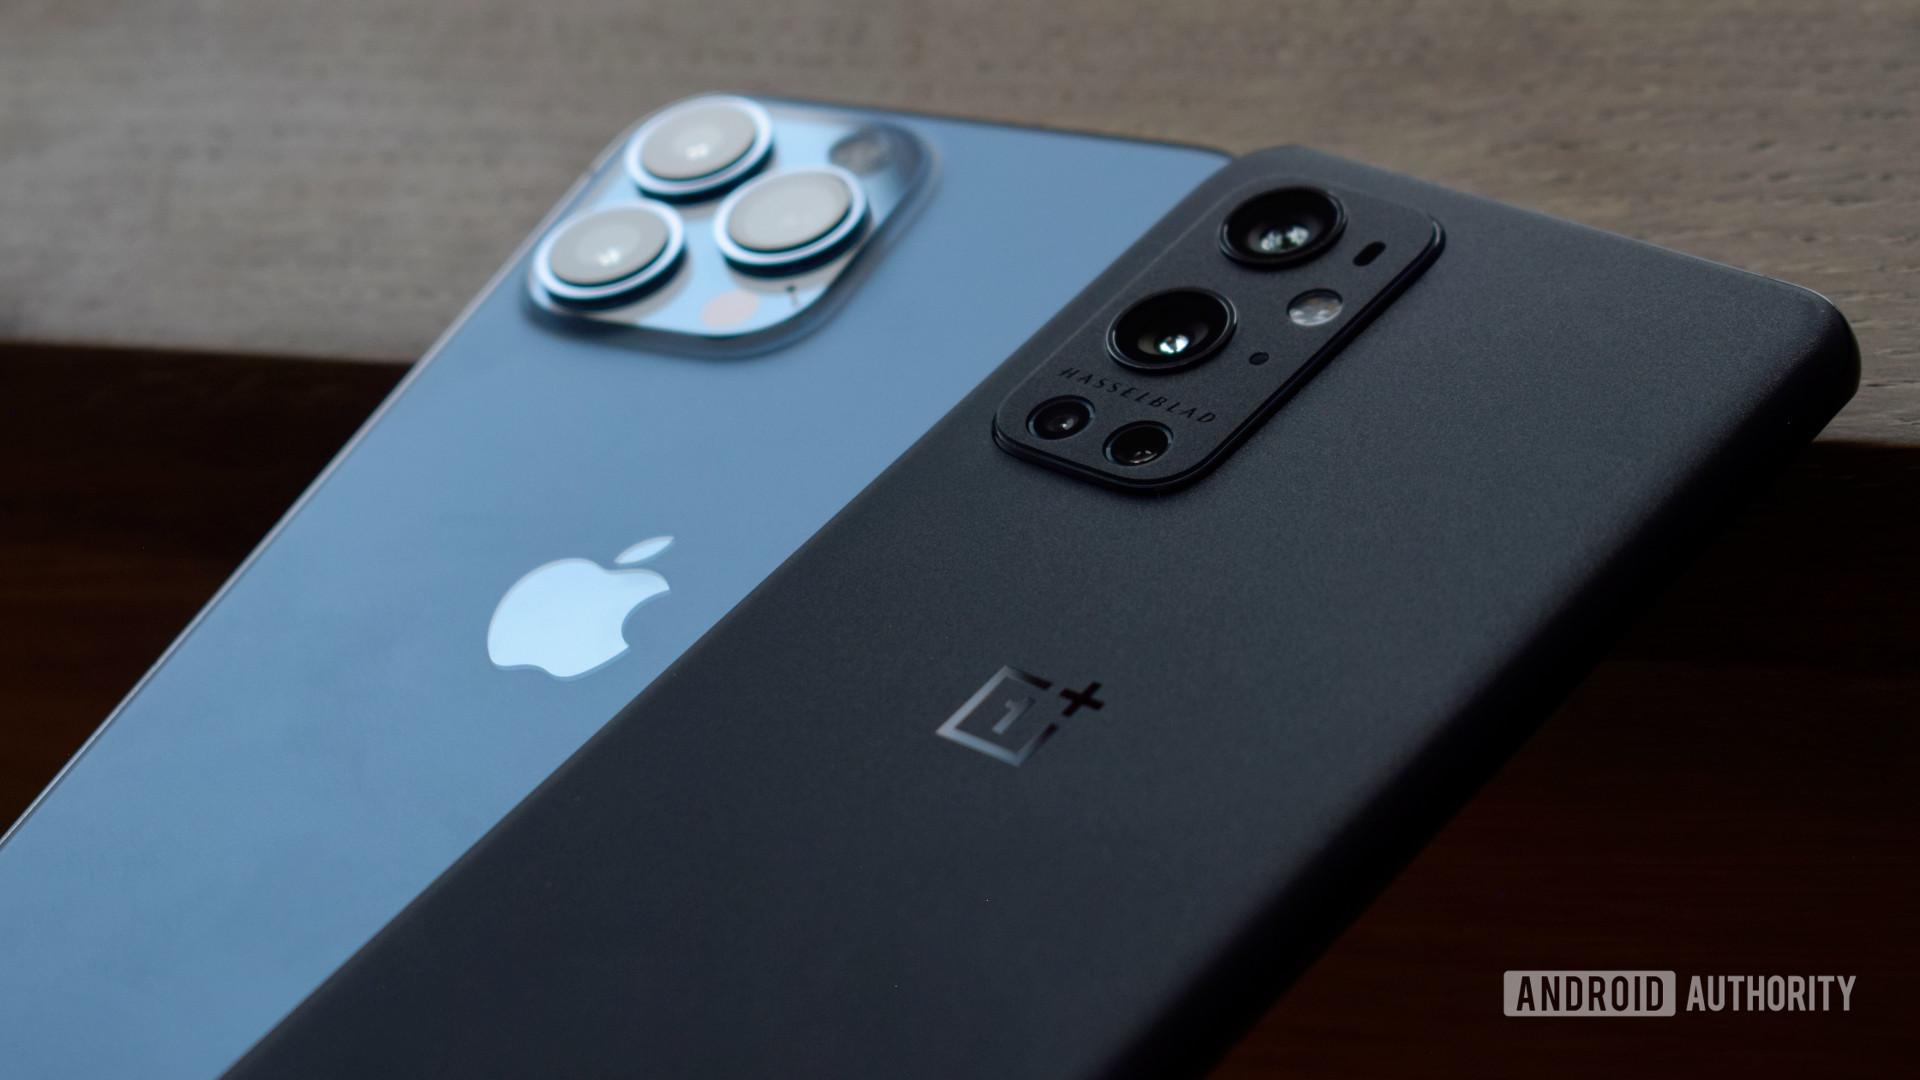 OnePlus 9 Pro vs Apple iPhone 13 Pro Max